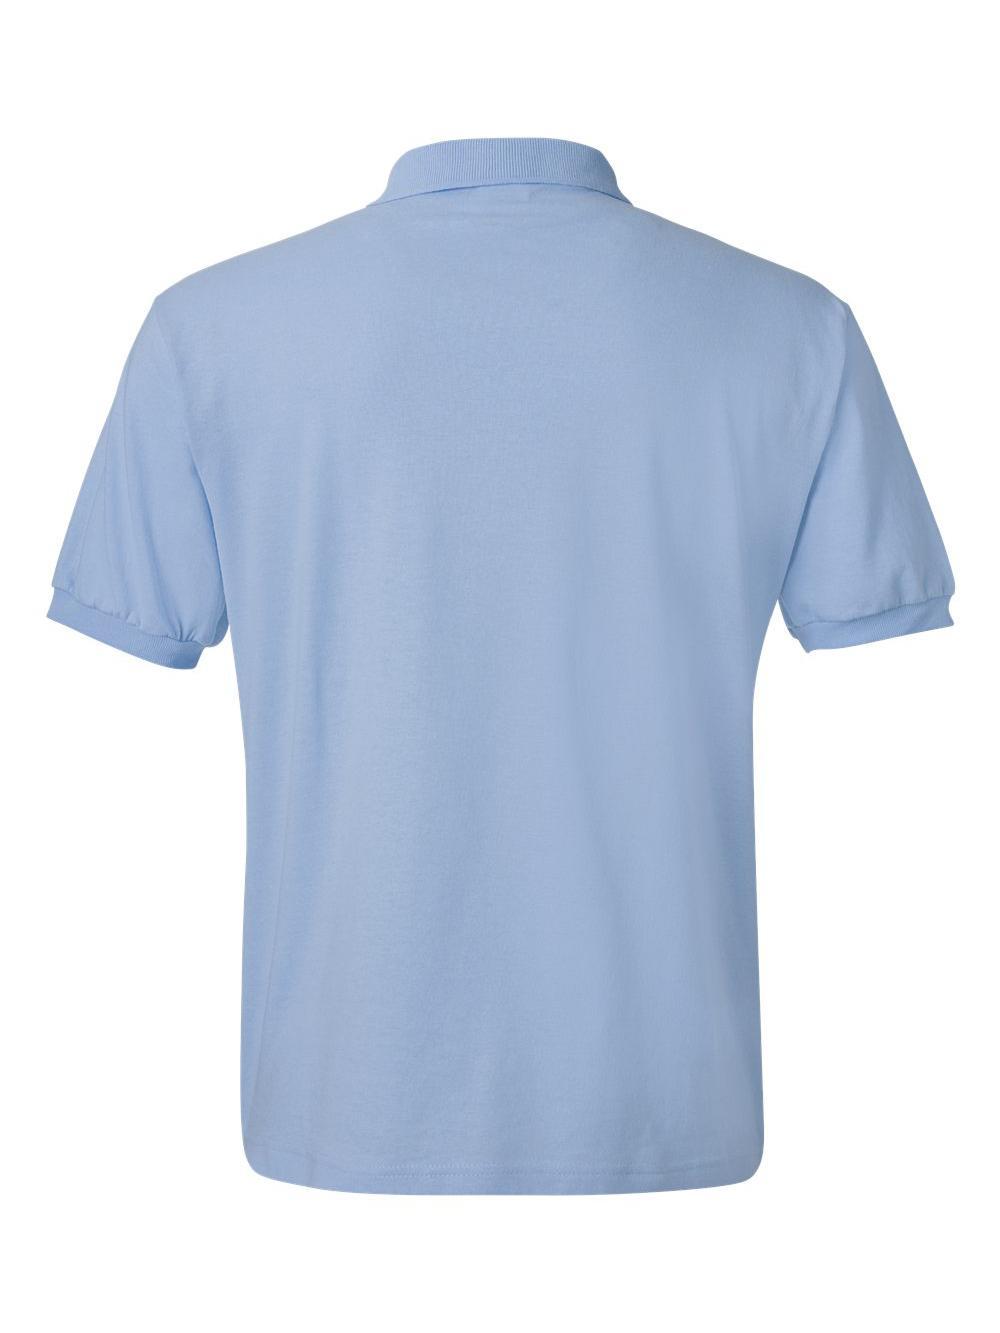 Hanes-Ecosmart-Jersey-Sport-Shirt-054X thumbnail 25